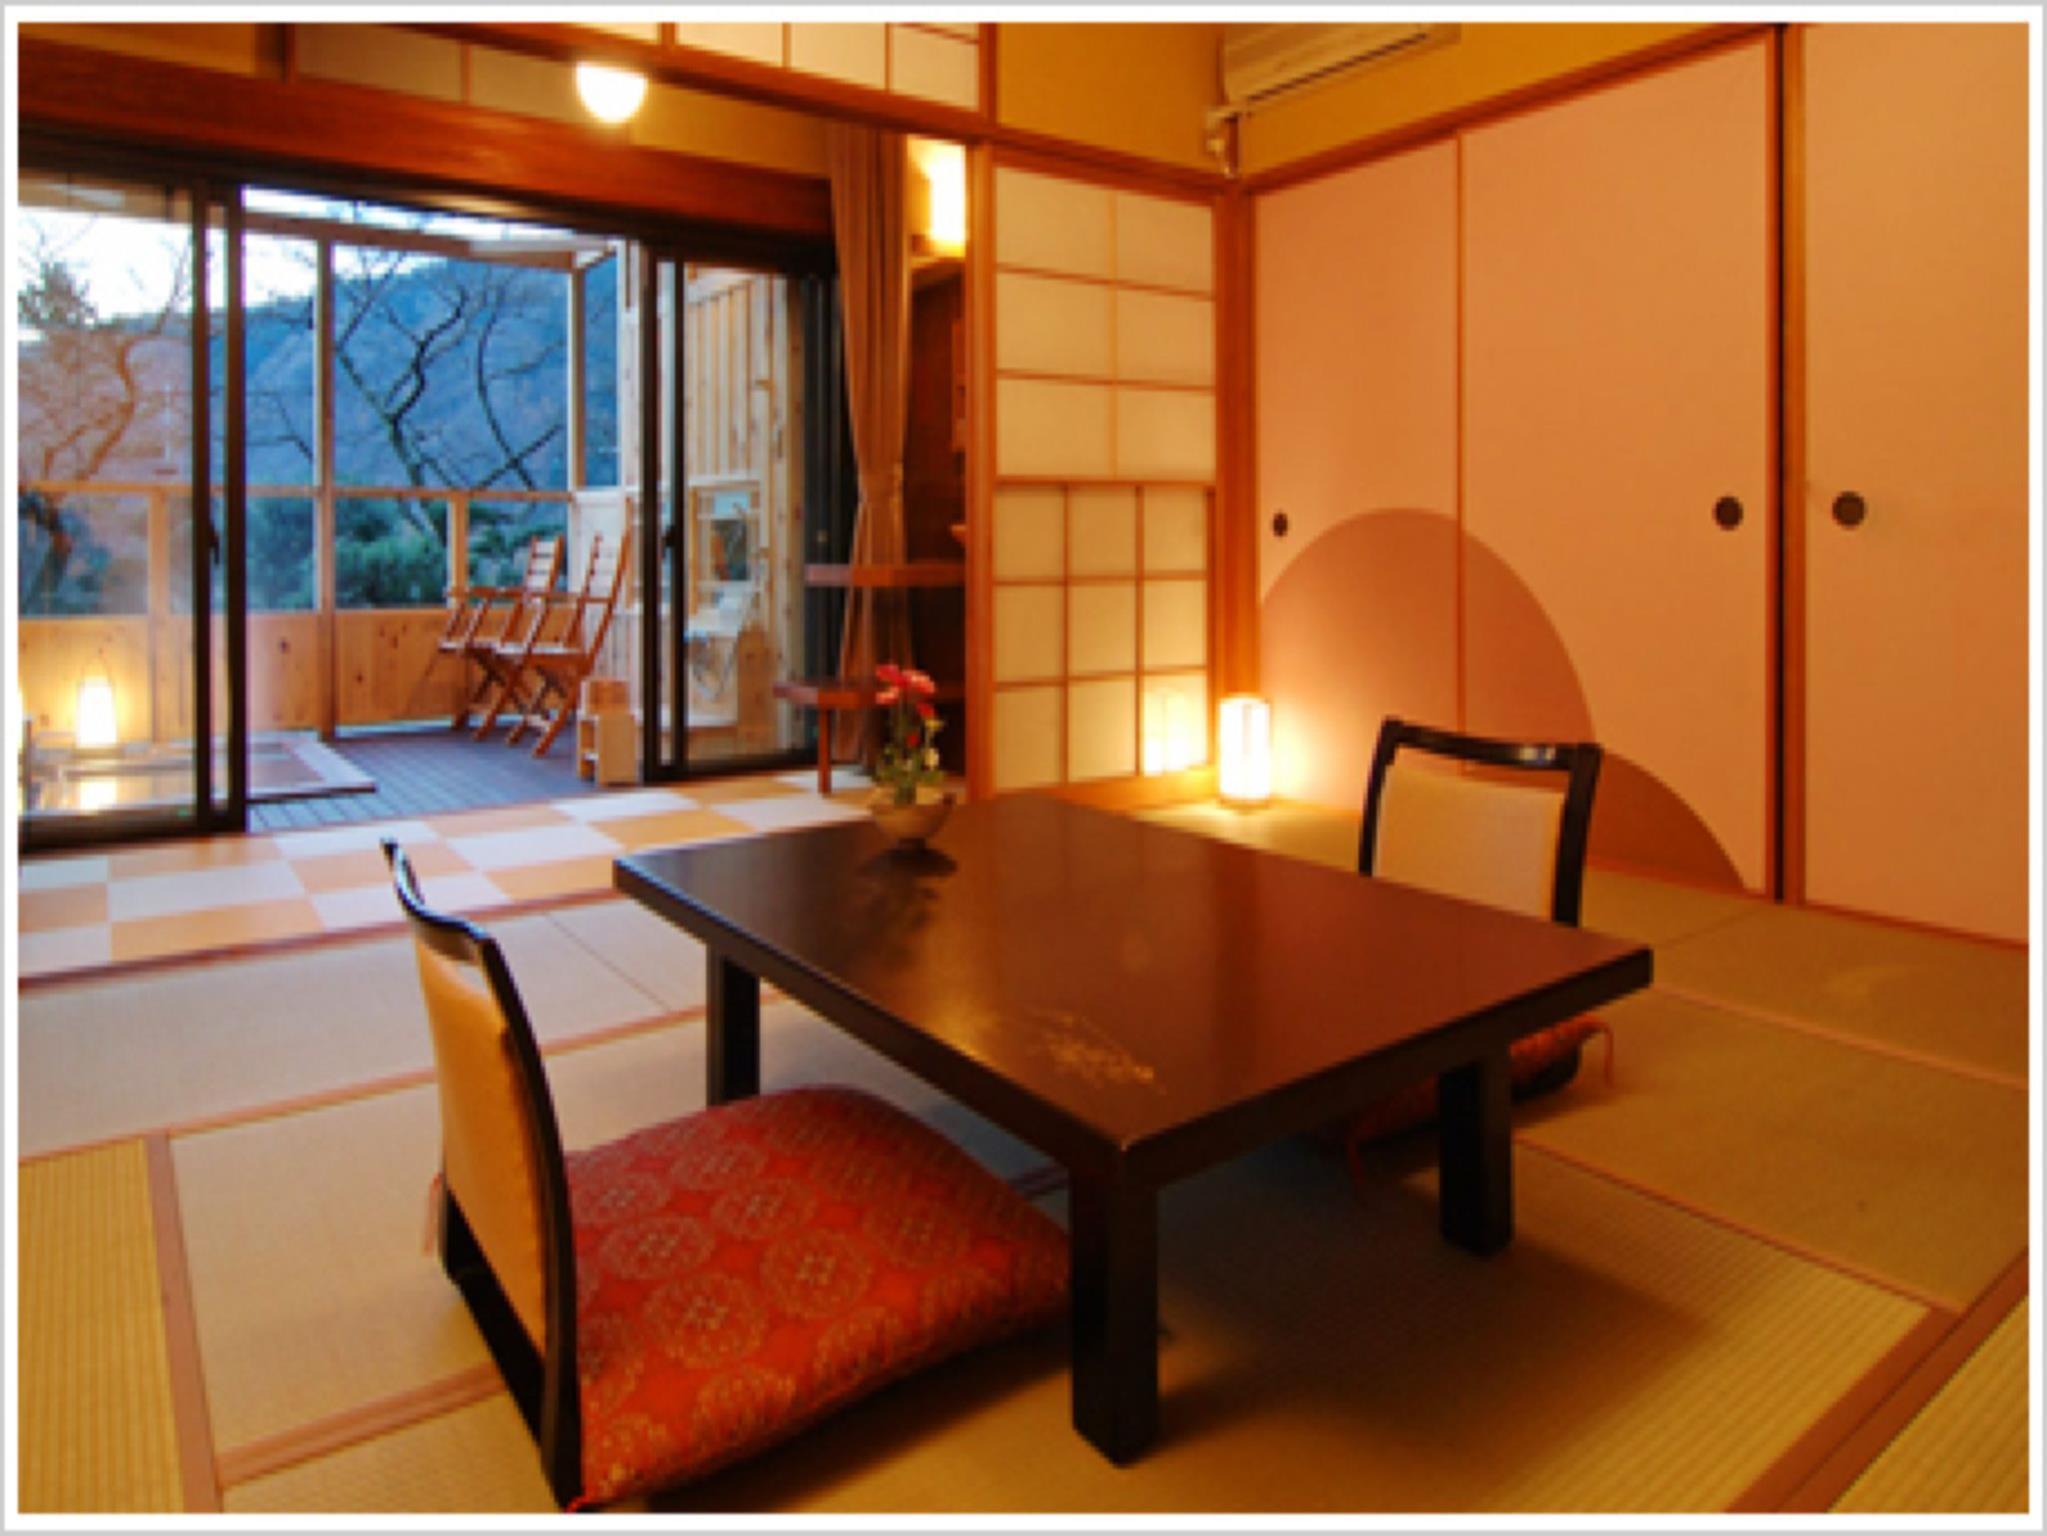 Vasca Da Bagno Giapponese : L arredamento bagno zen di ispirazione giapponese u anews